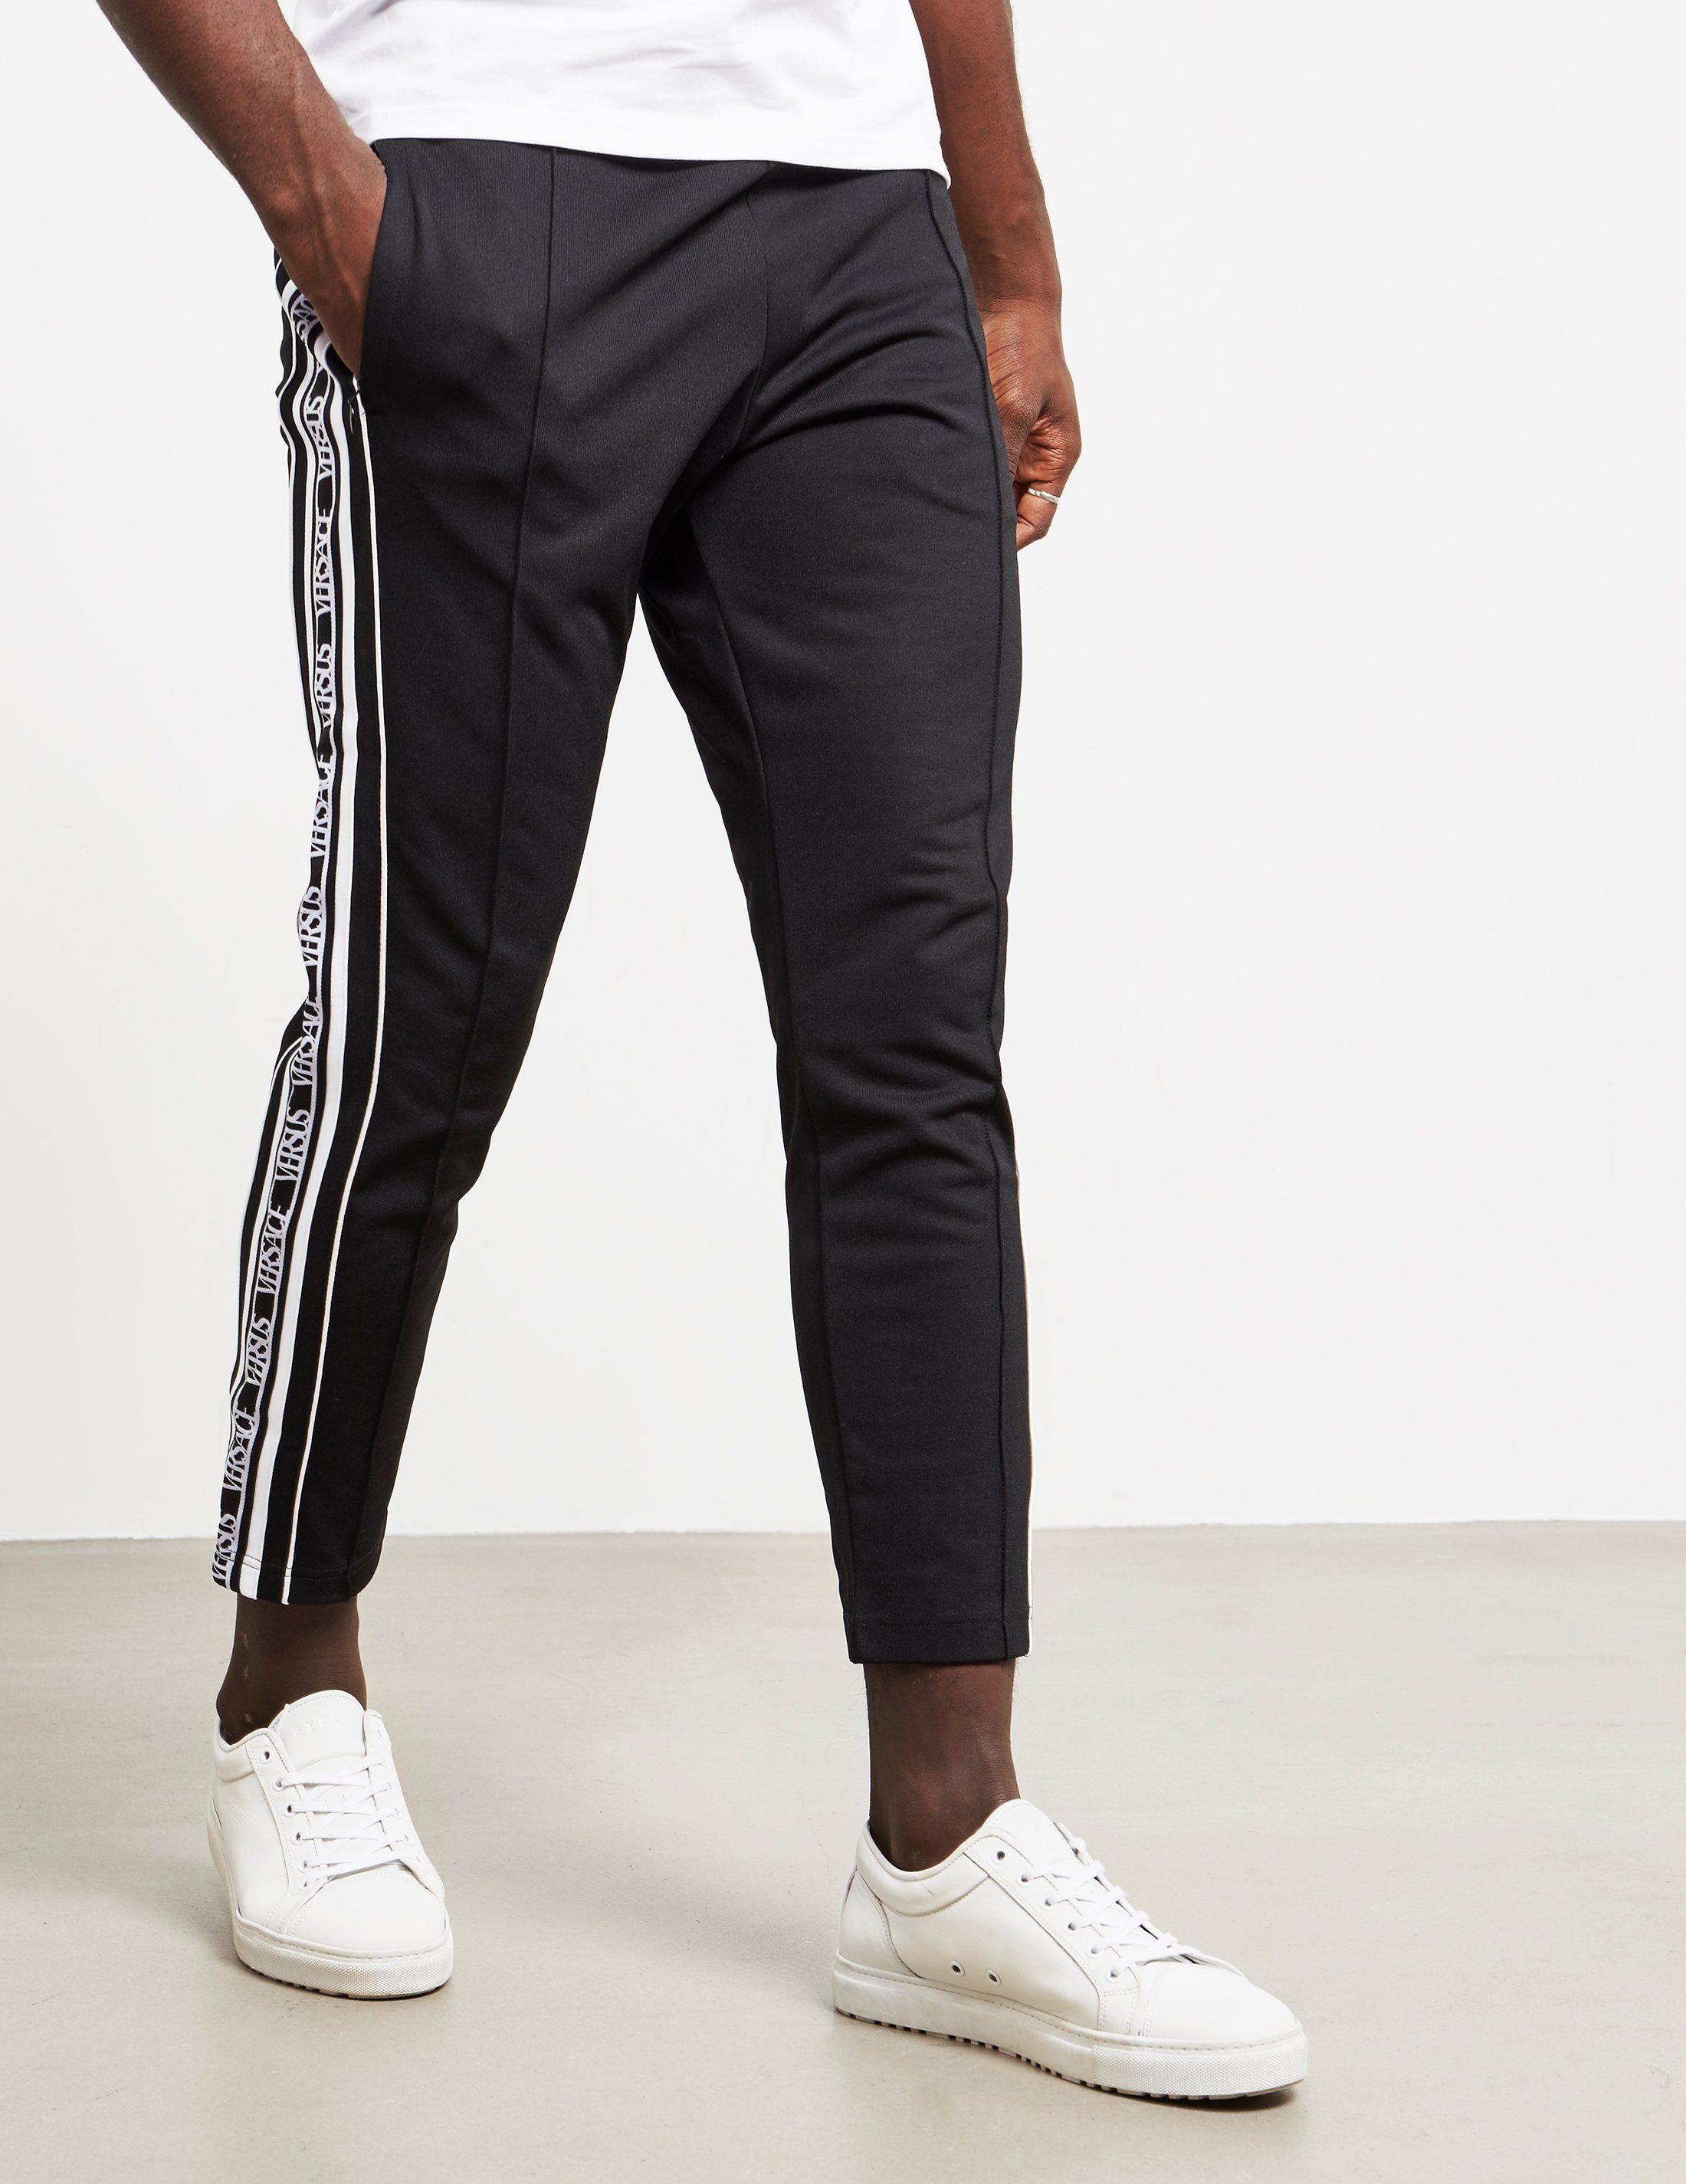 Versus Versace Tape Track Pants